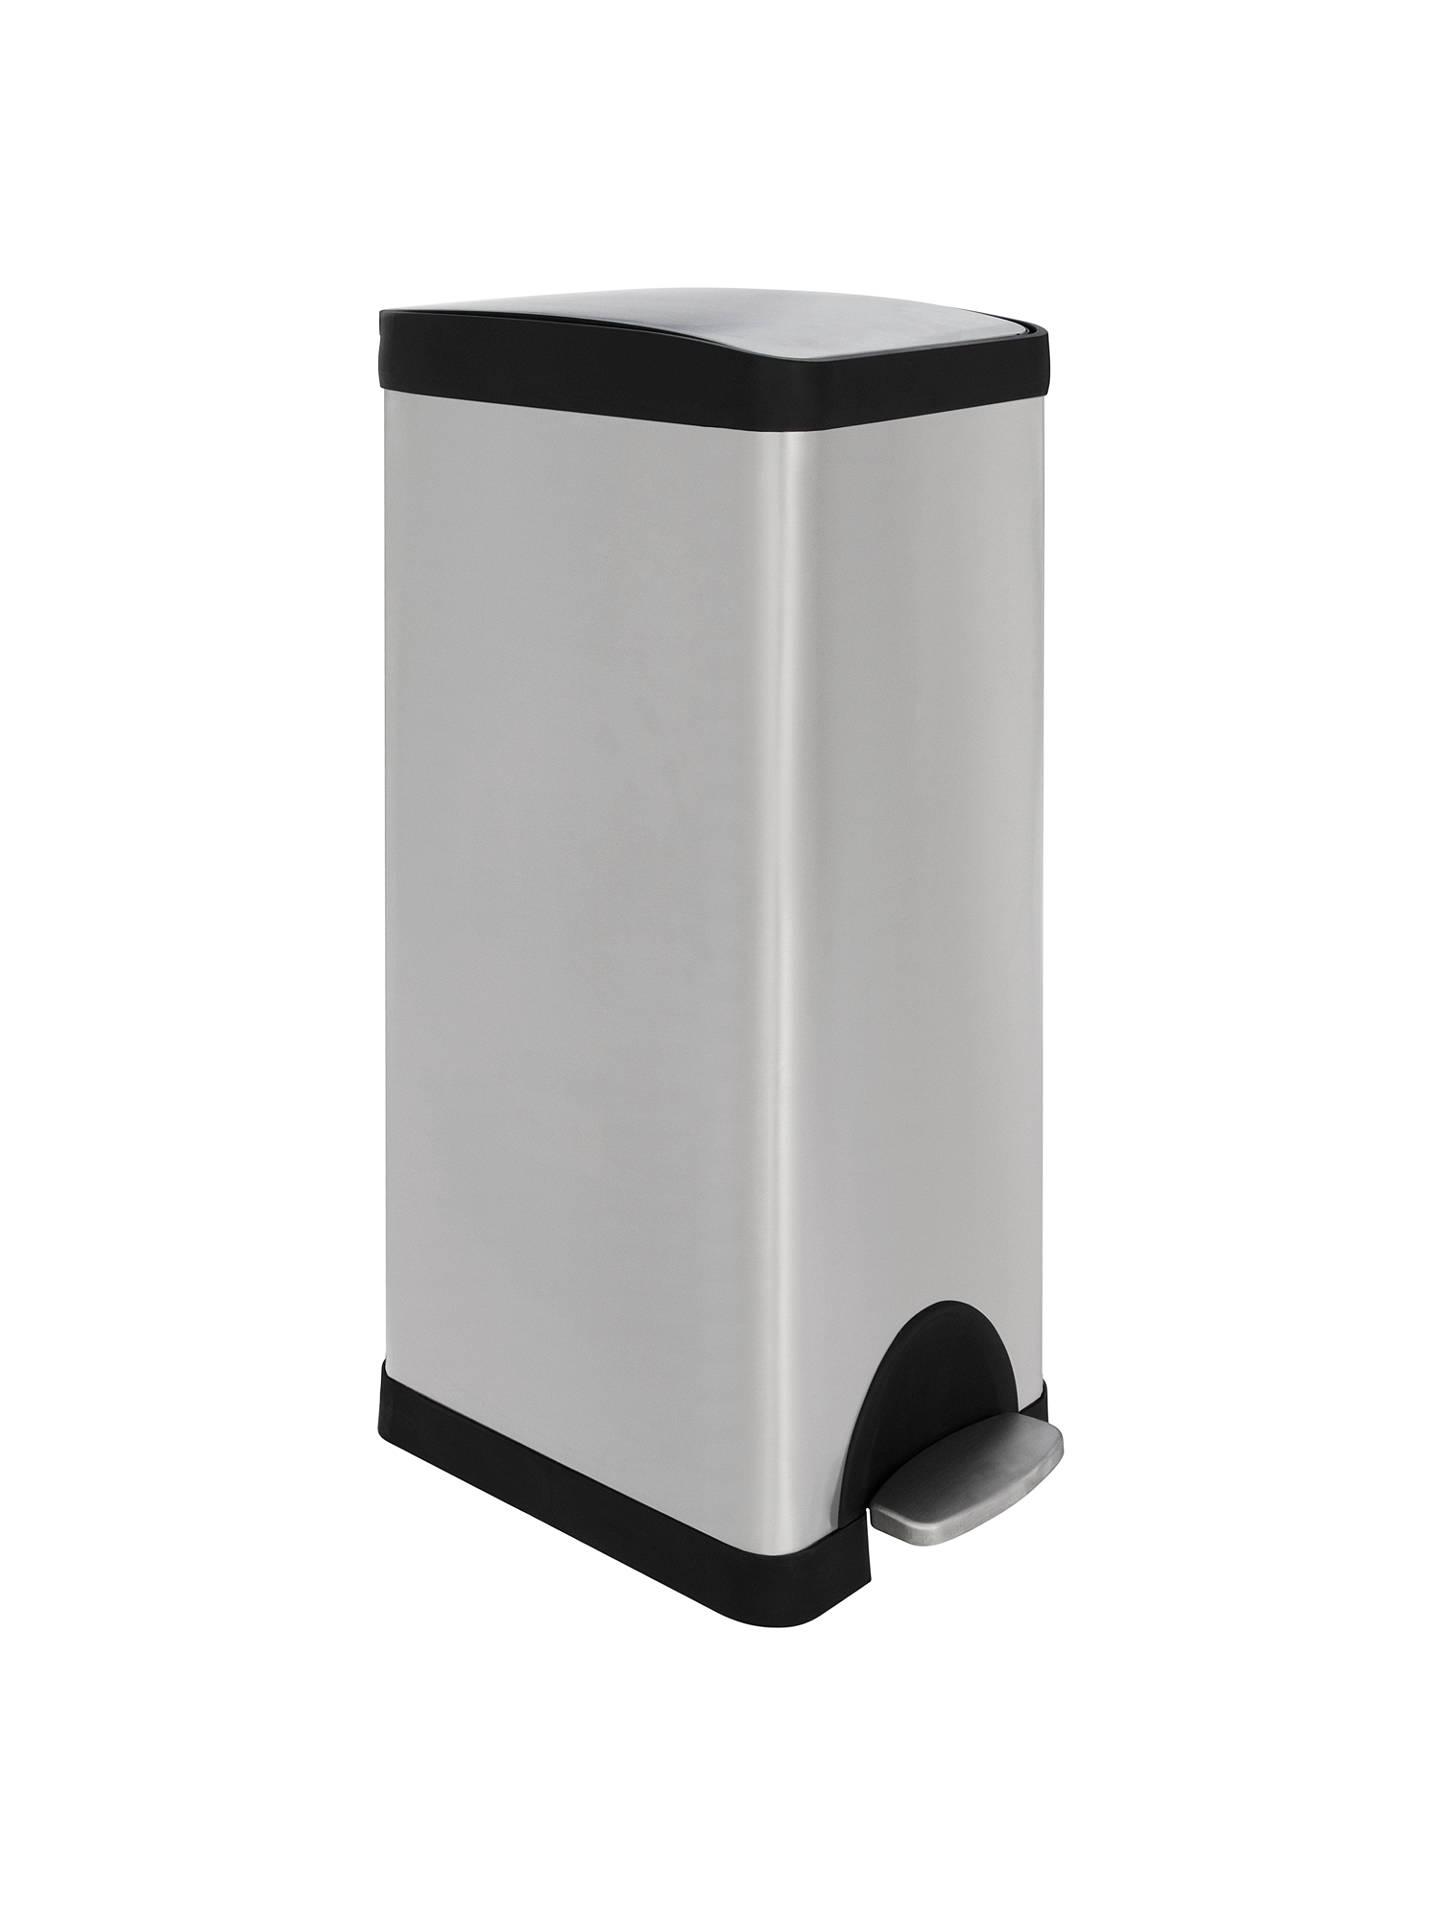 john lewis partners slim stainless steel pedal bin 30l. Black Bedroom Furniture Sets. Home Design Ideas